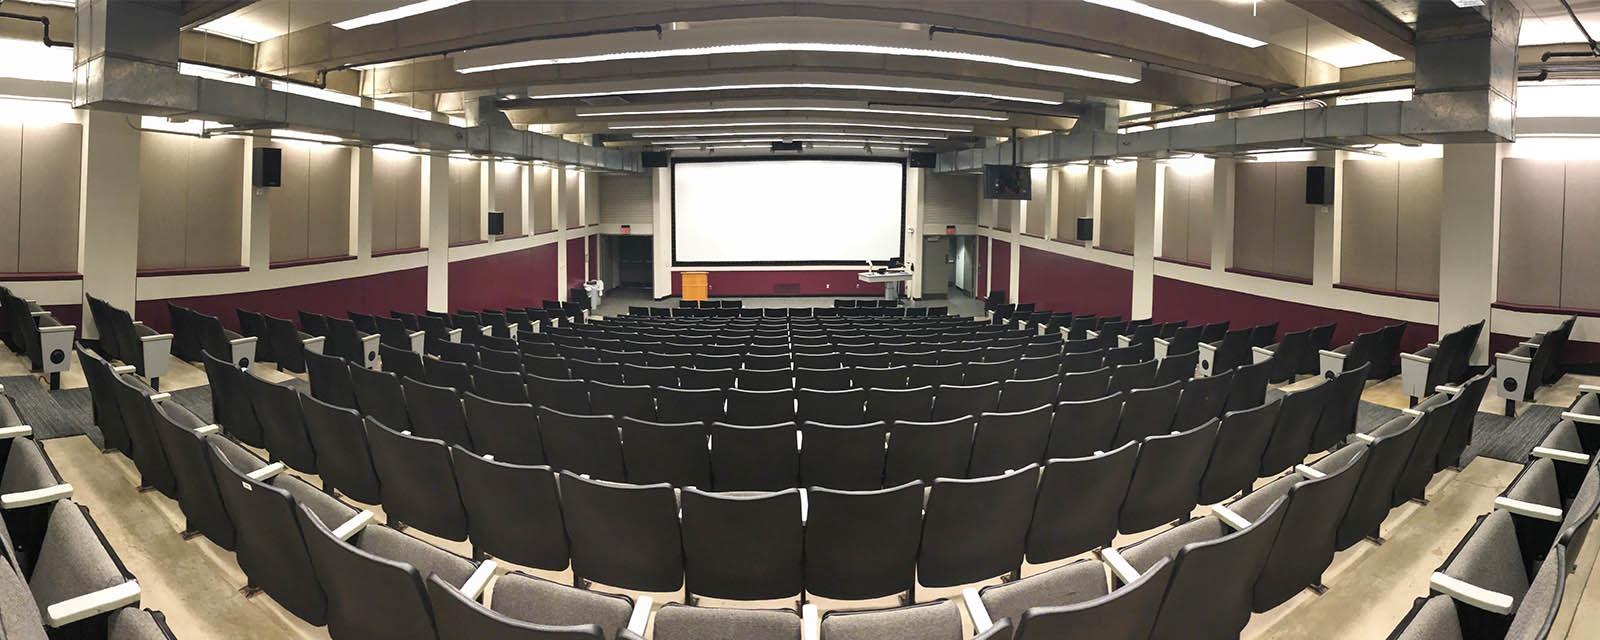 shaffer shemin auditorium